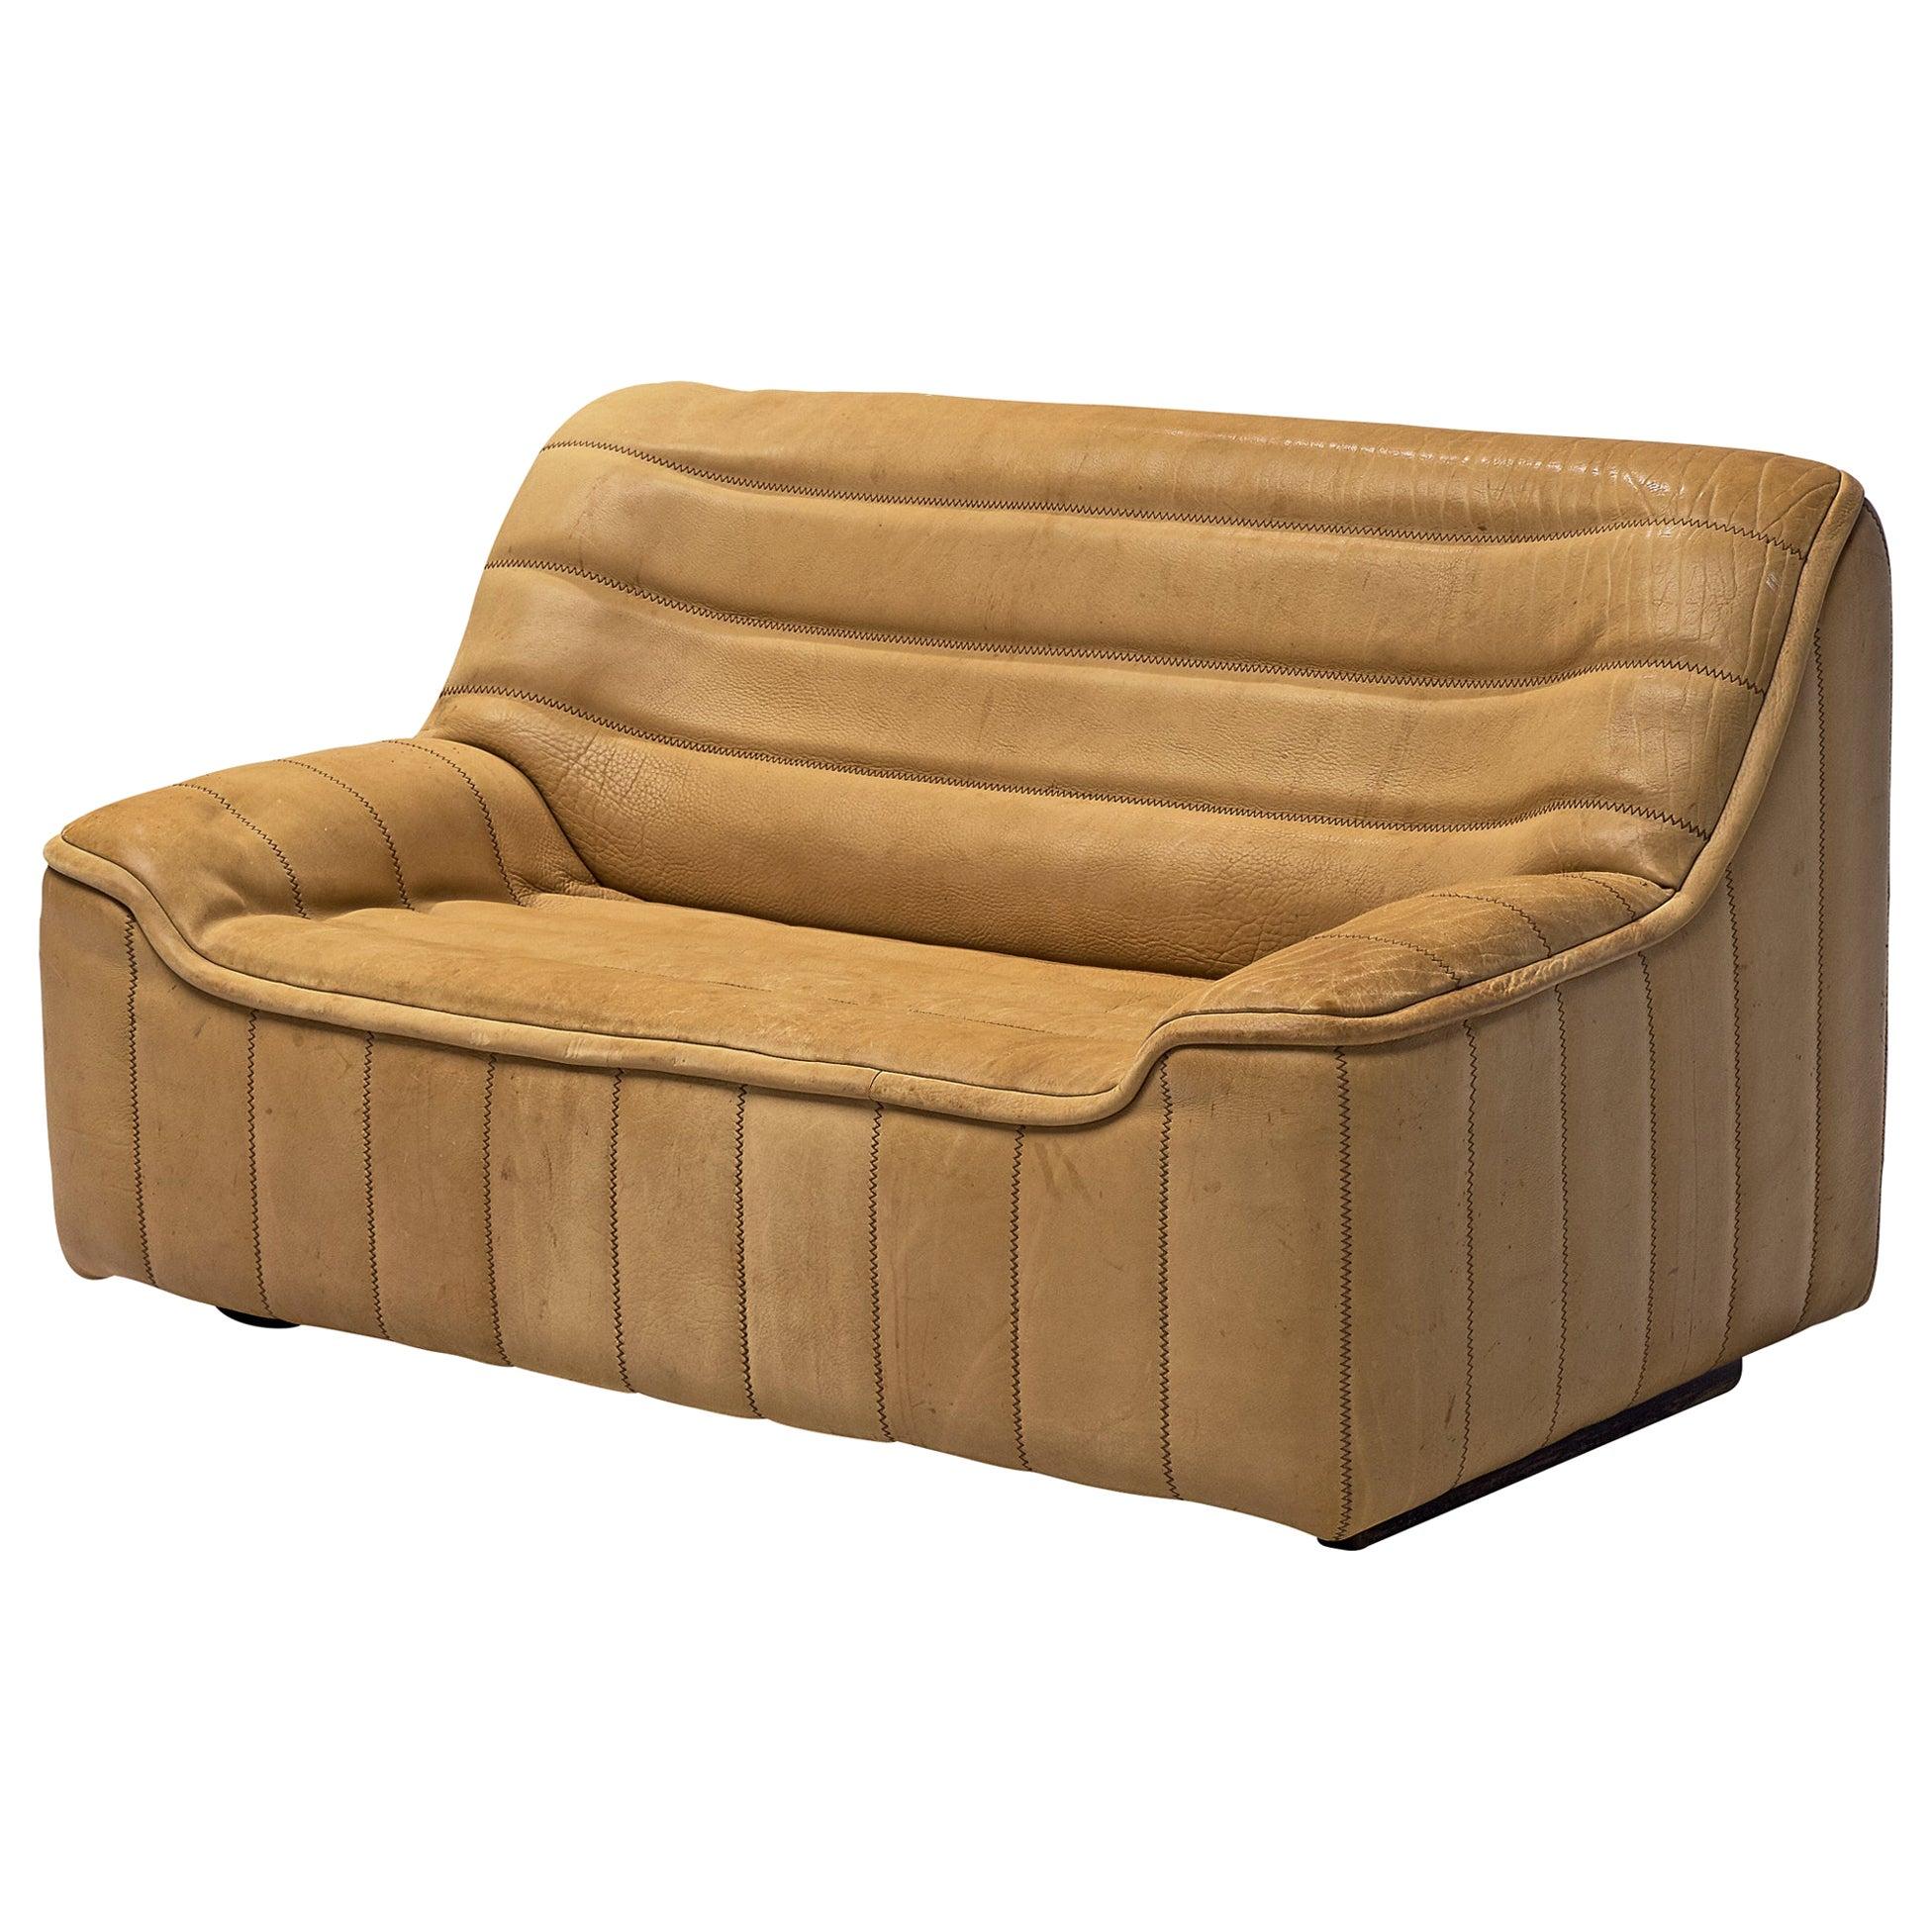 De Sede 'DS84' Sofa in Buffalo Leather